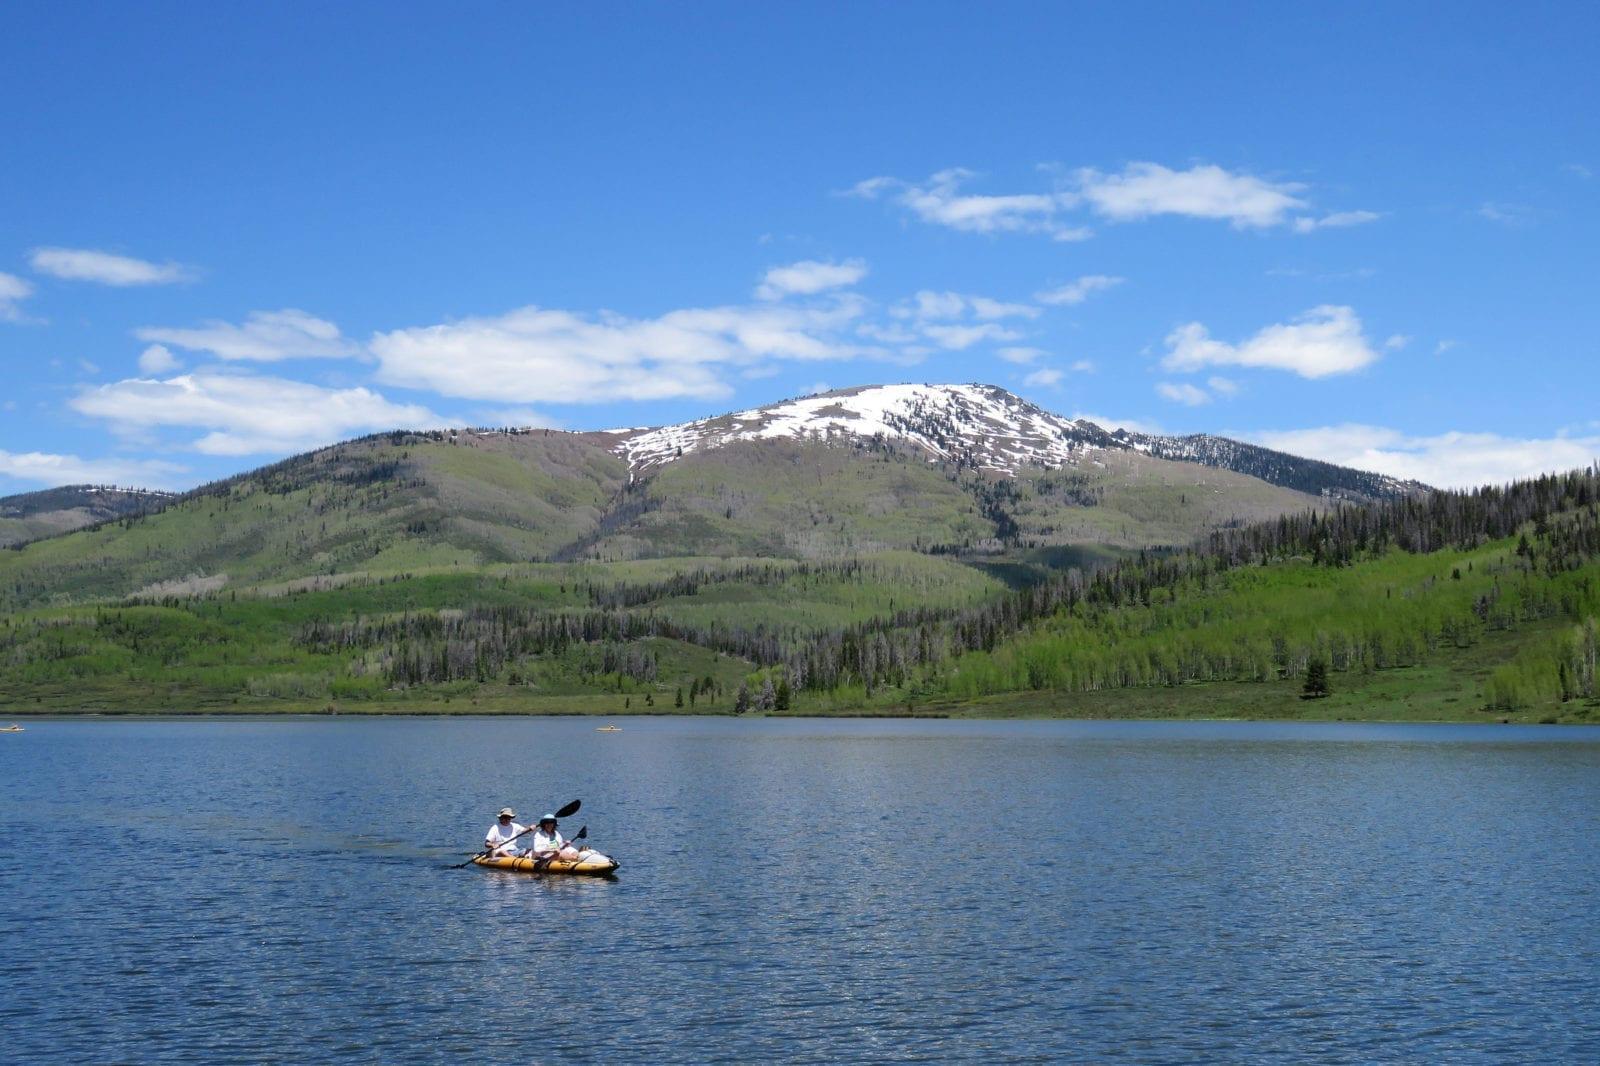 image of kayakers on pearl lake